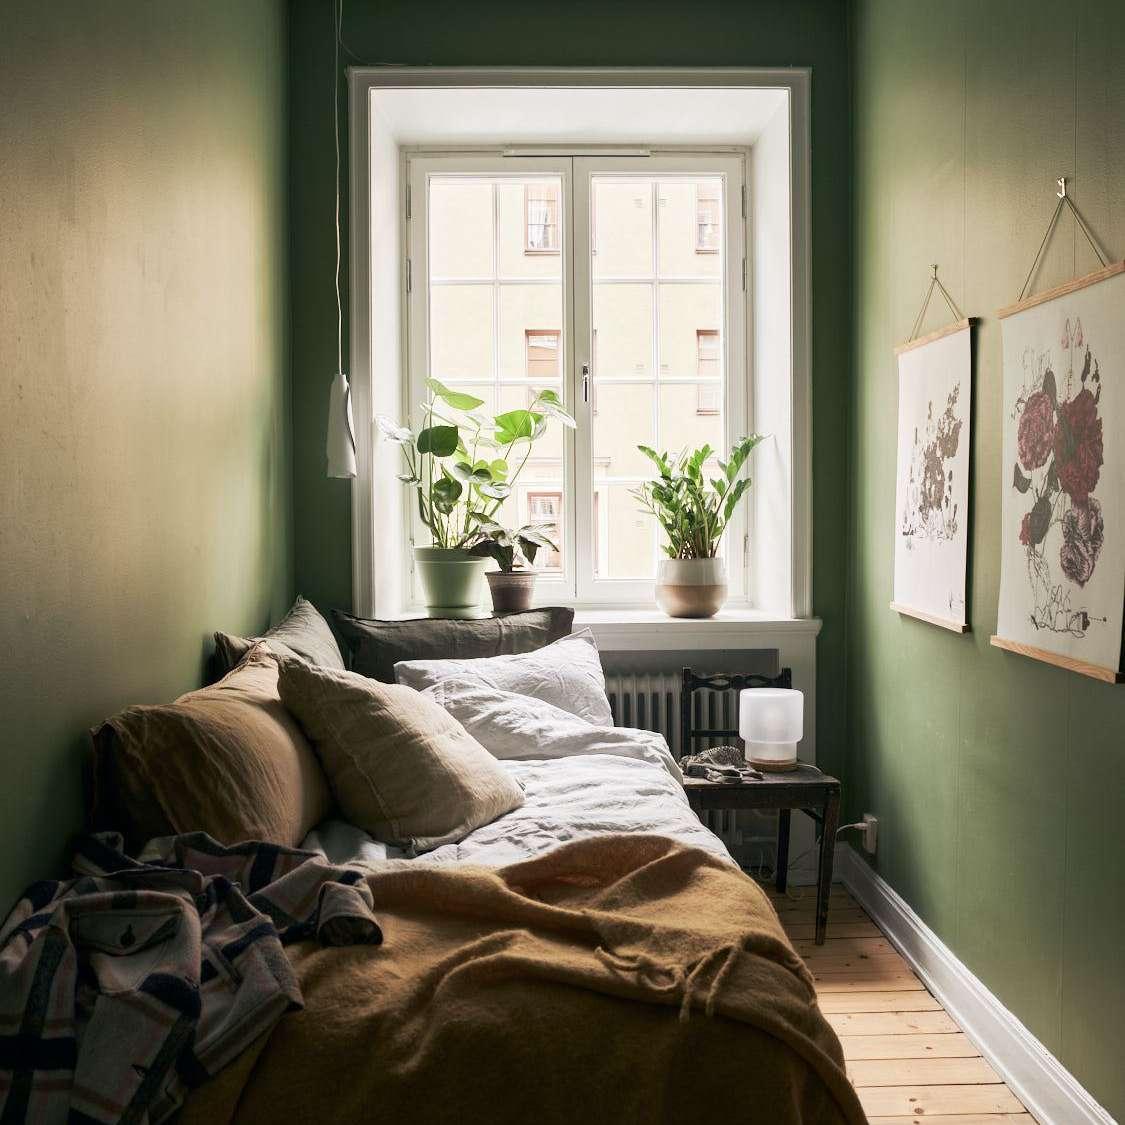 ZZ plant on a bright windowsill in a cozy green bedroom